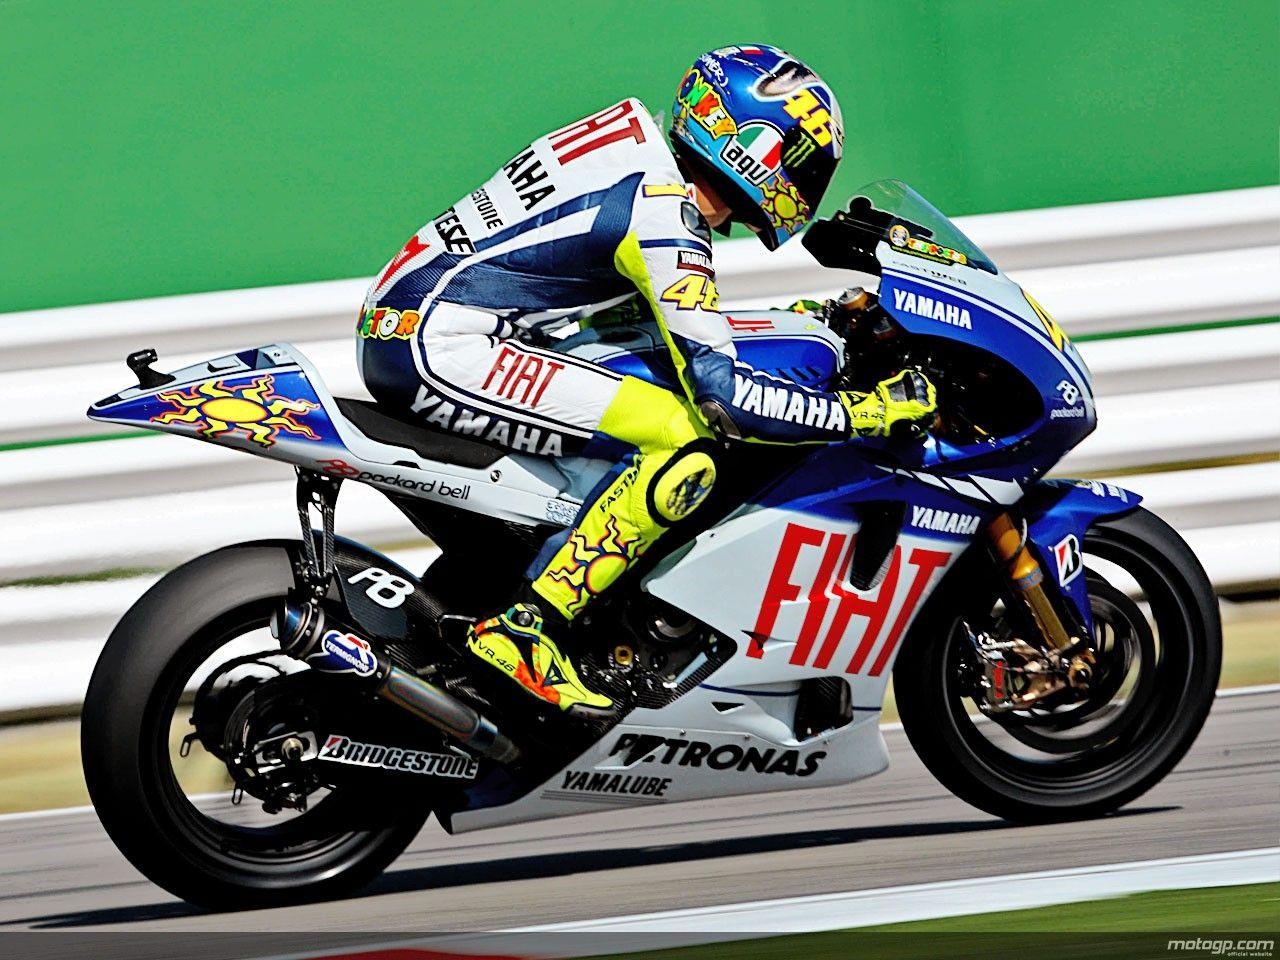 Yamaha-YZR-M1-Valentino-Rossi-2009.jpg (1280×960)